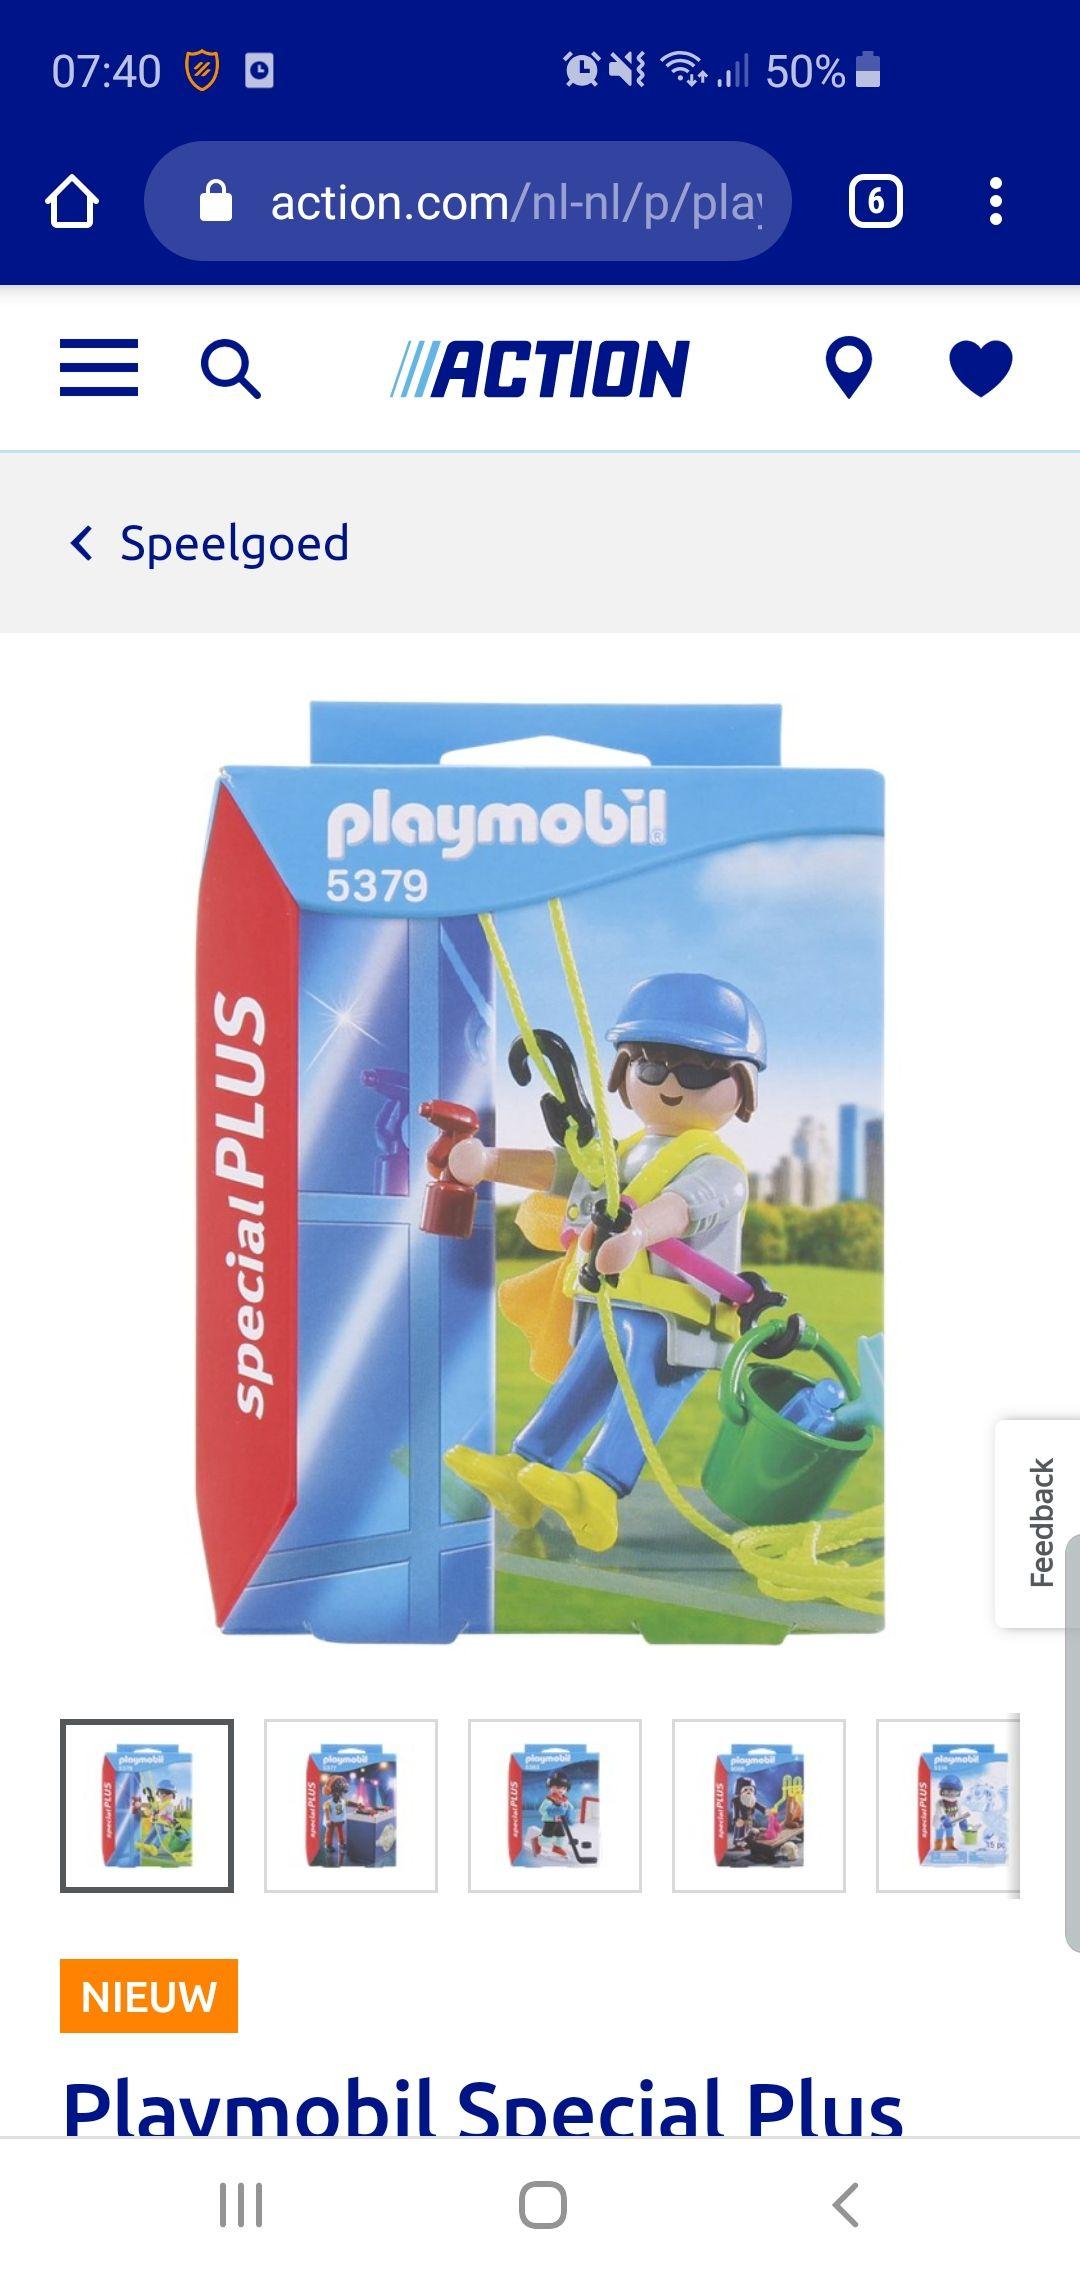 Action - Playmobil special plus beroepen